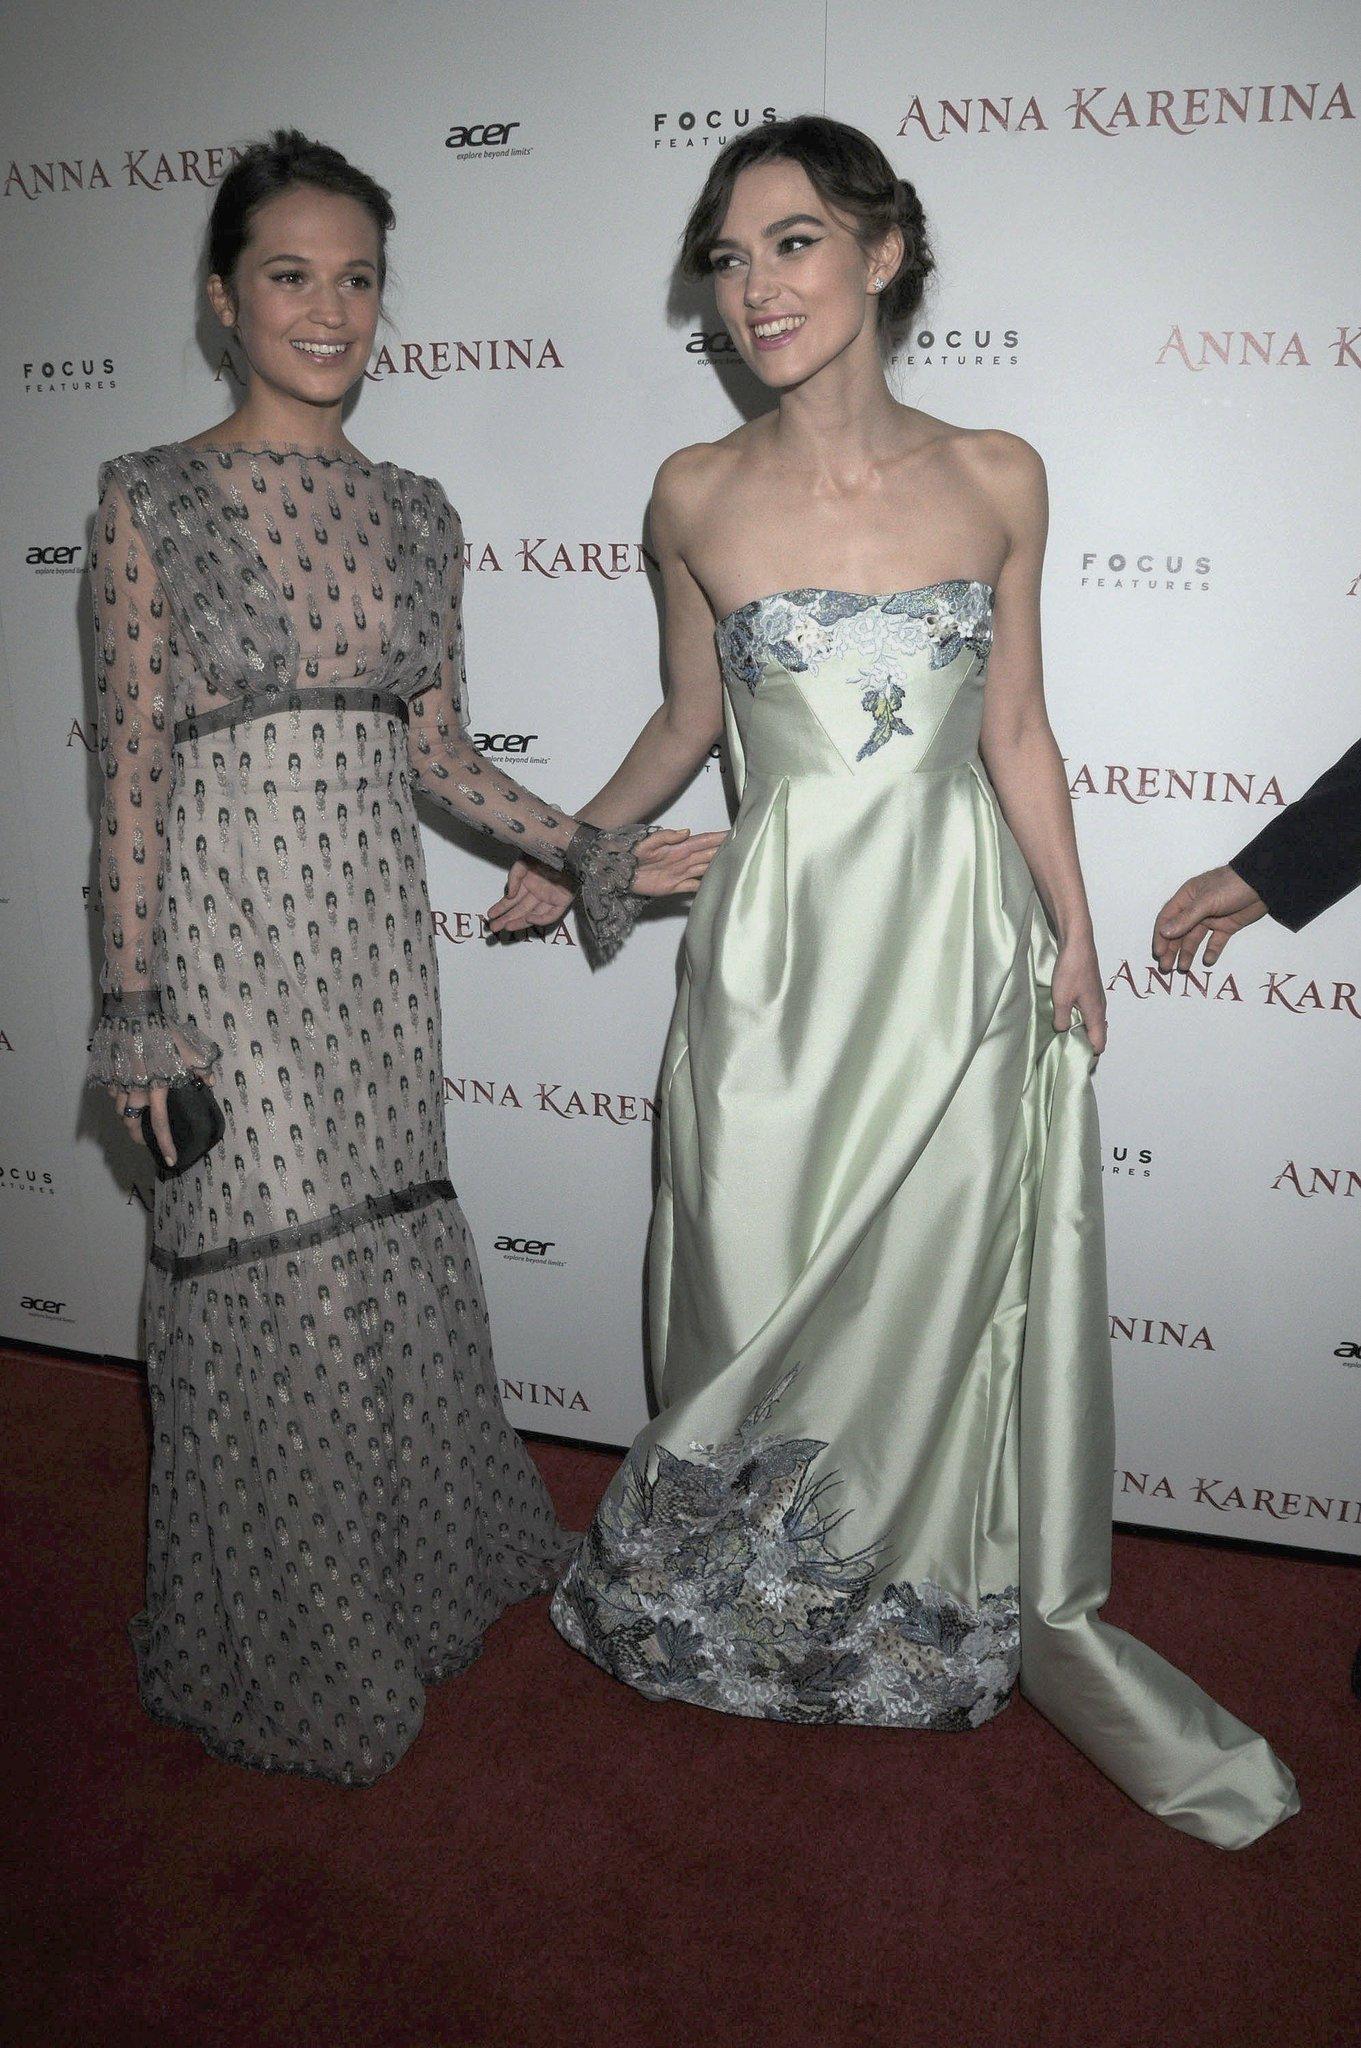 Happy 33rd birthday to princess keira knightley! love you anna karenina los angeles premiere, 2012.